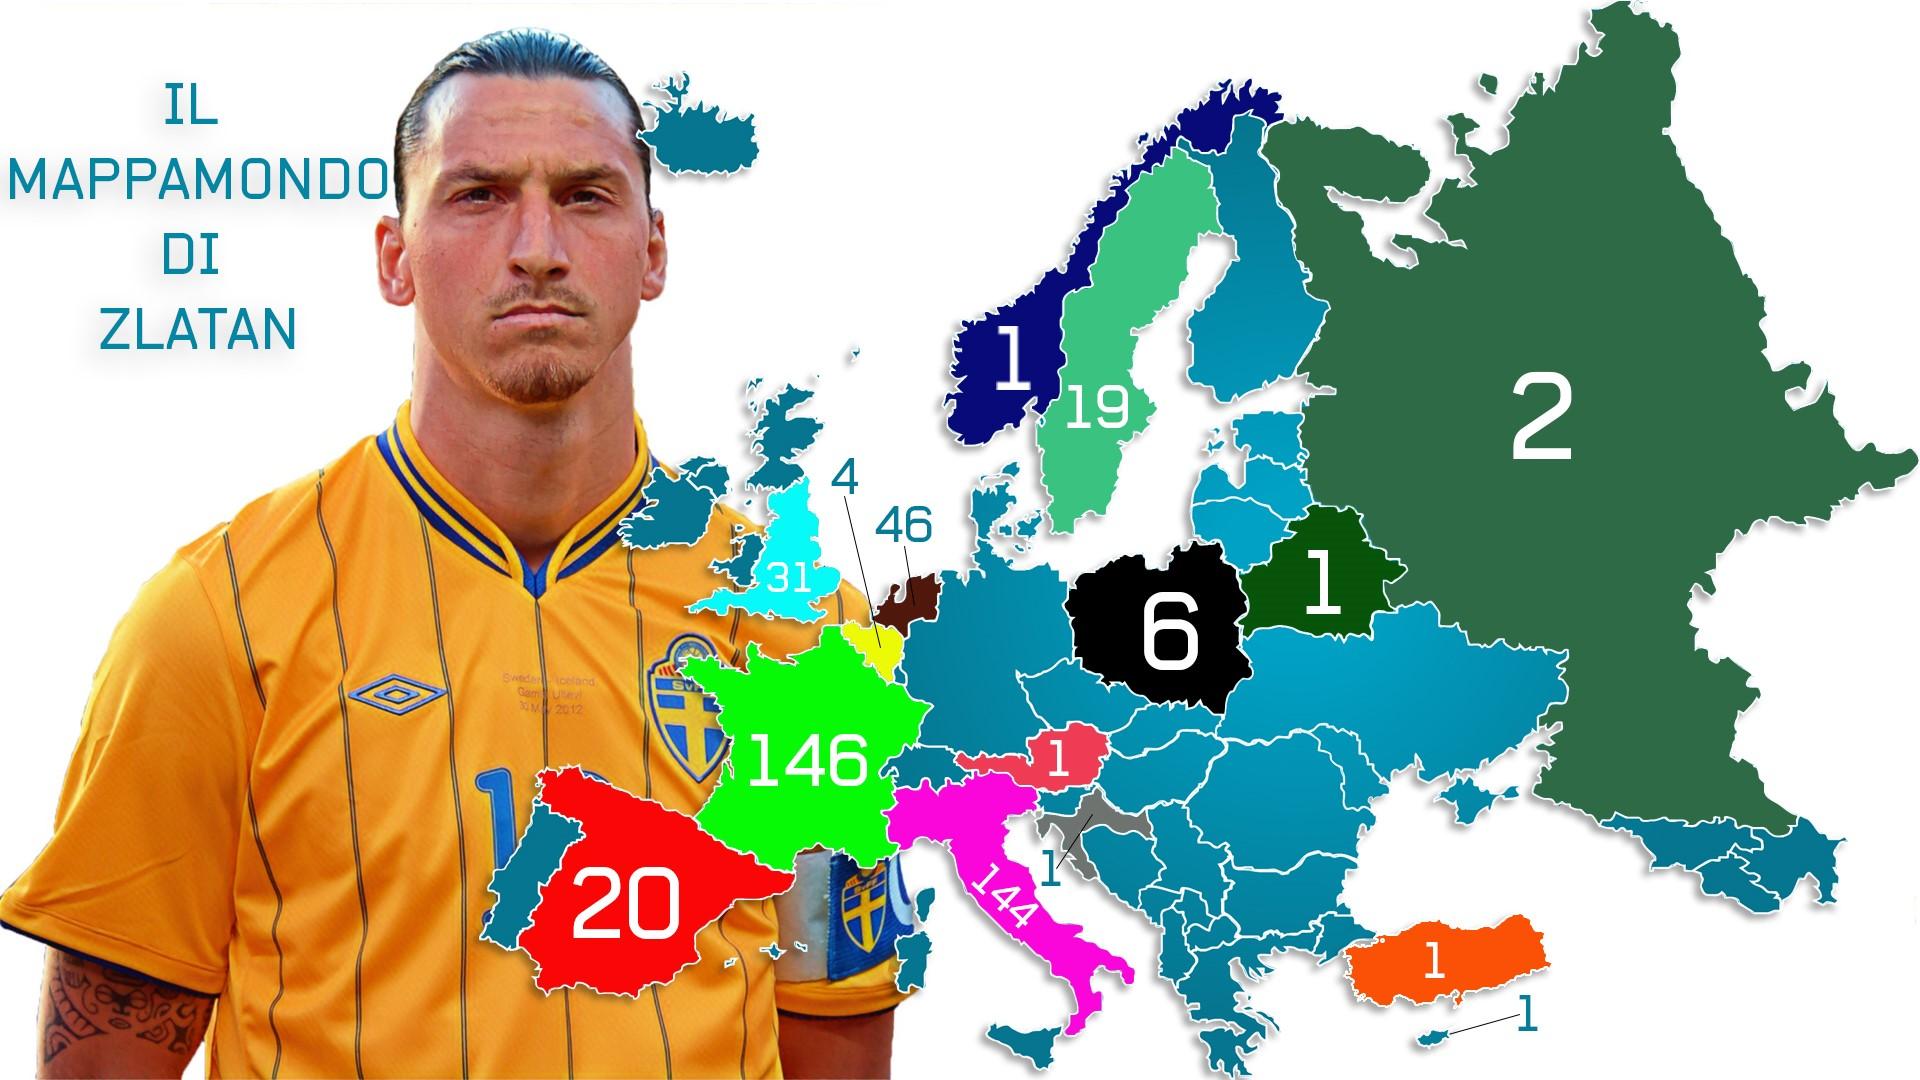 https://i.eurosport.com/2018/05/10/2331784.jpg